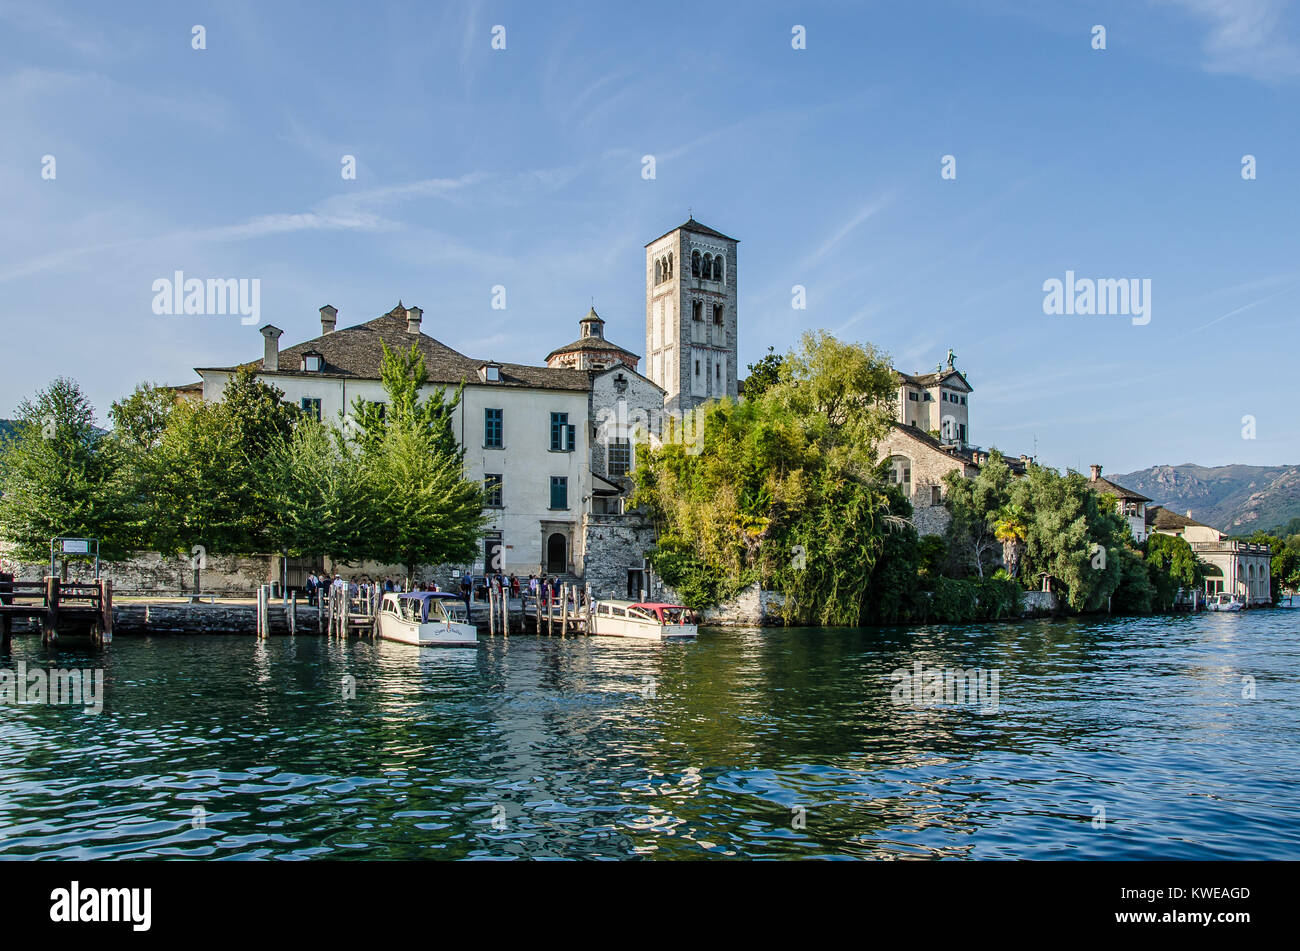 Lake Orta is one the most beautiful of the Italian lakes. Isola San Giulio or San Giulio Island is an island within - Stock Image